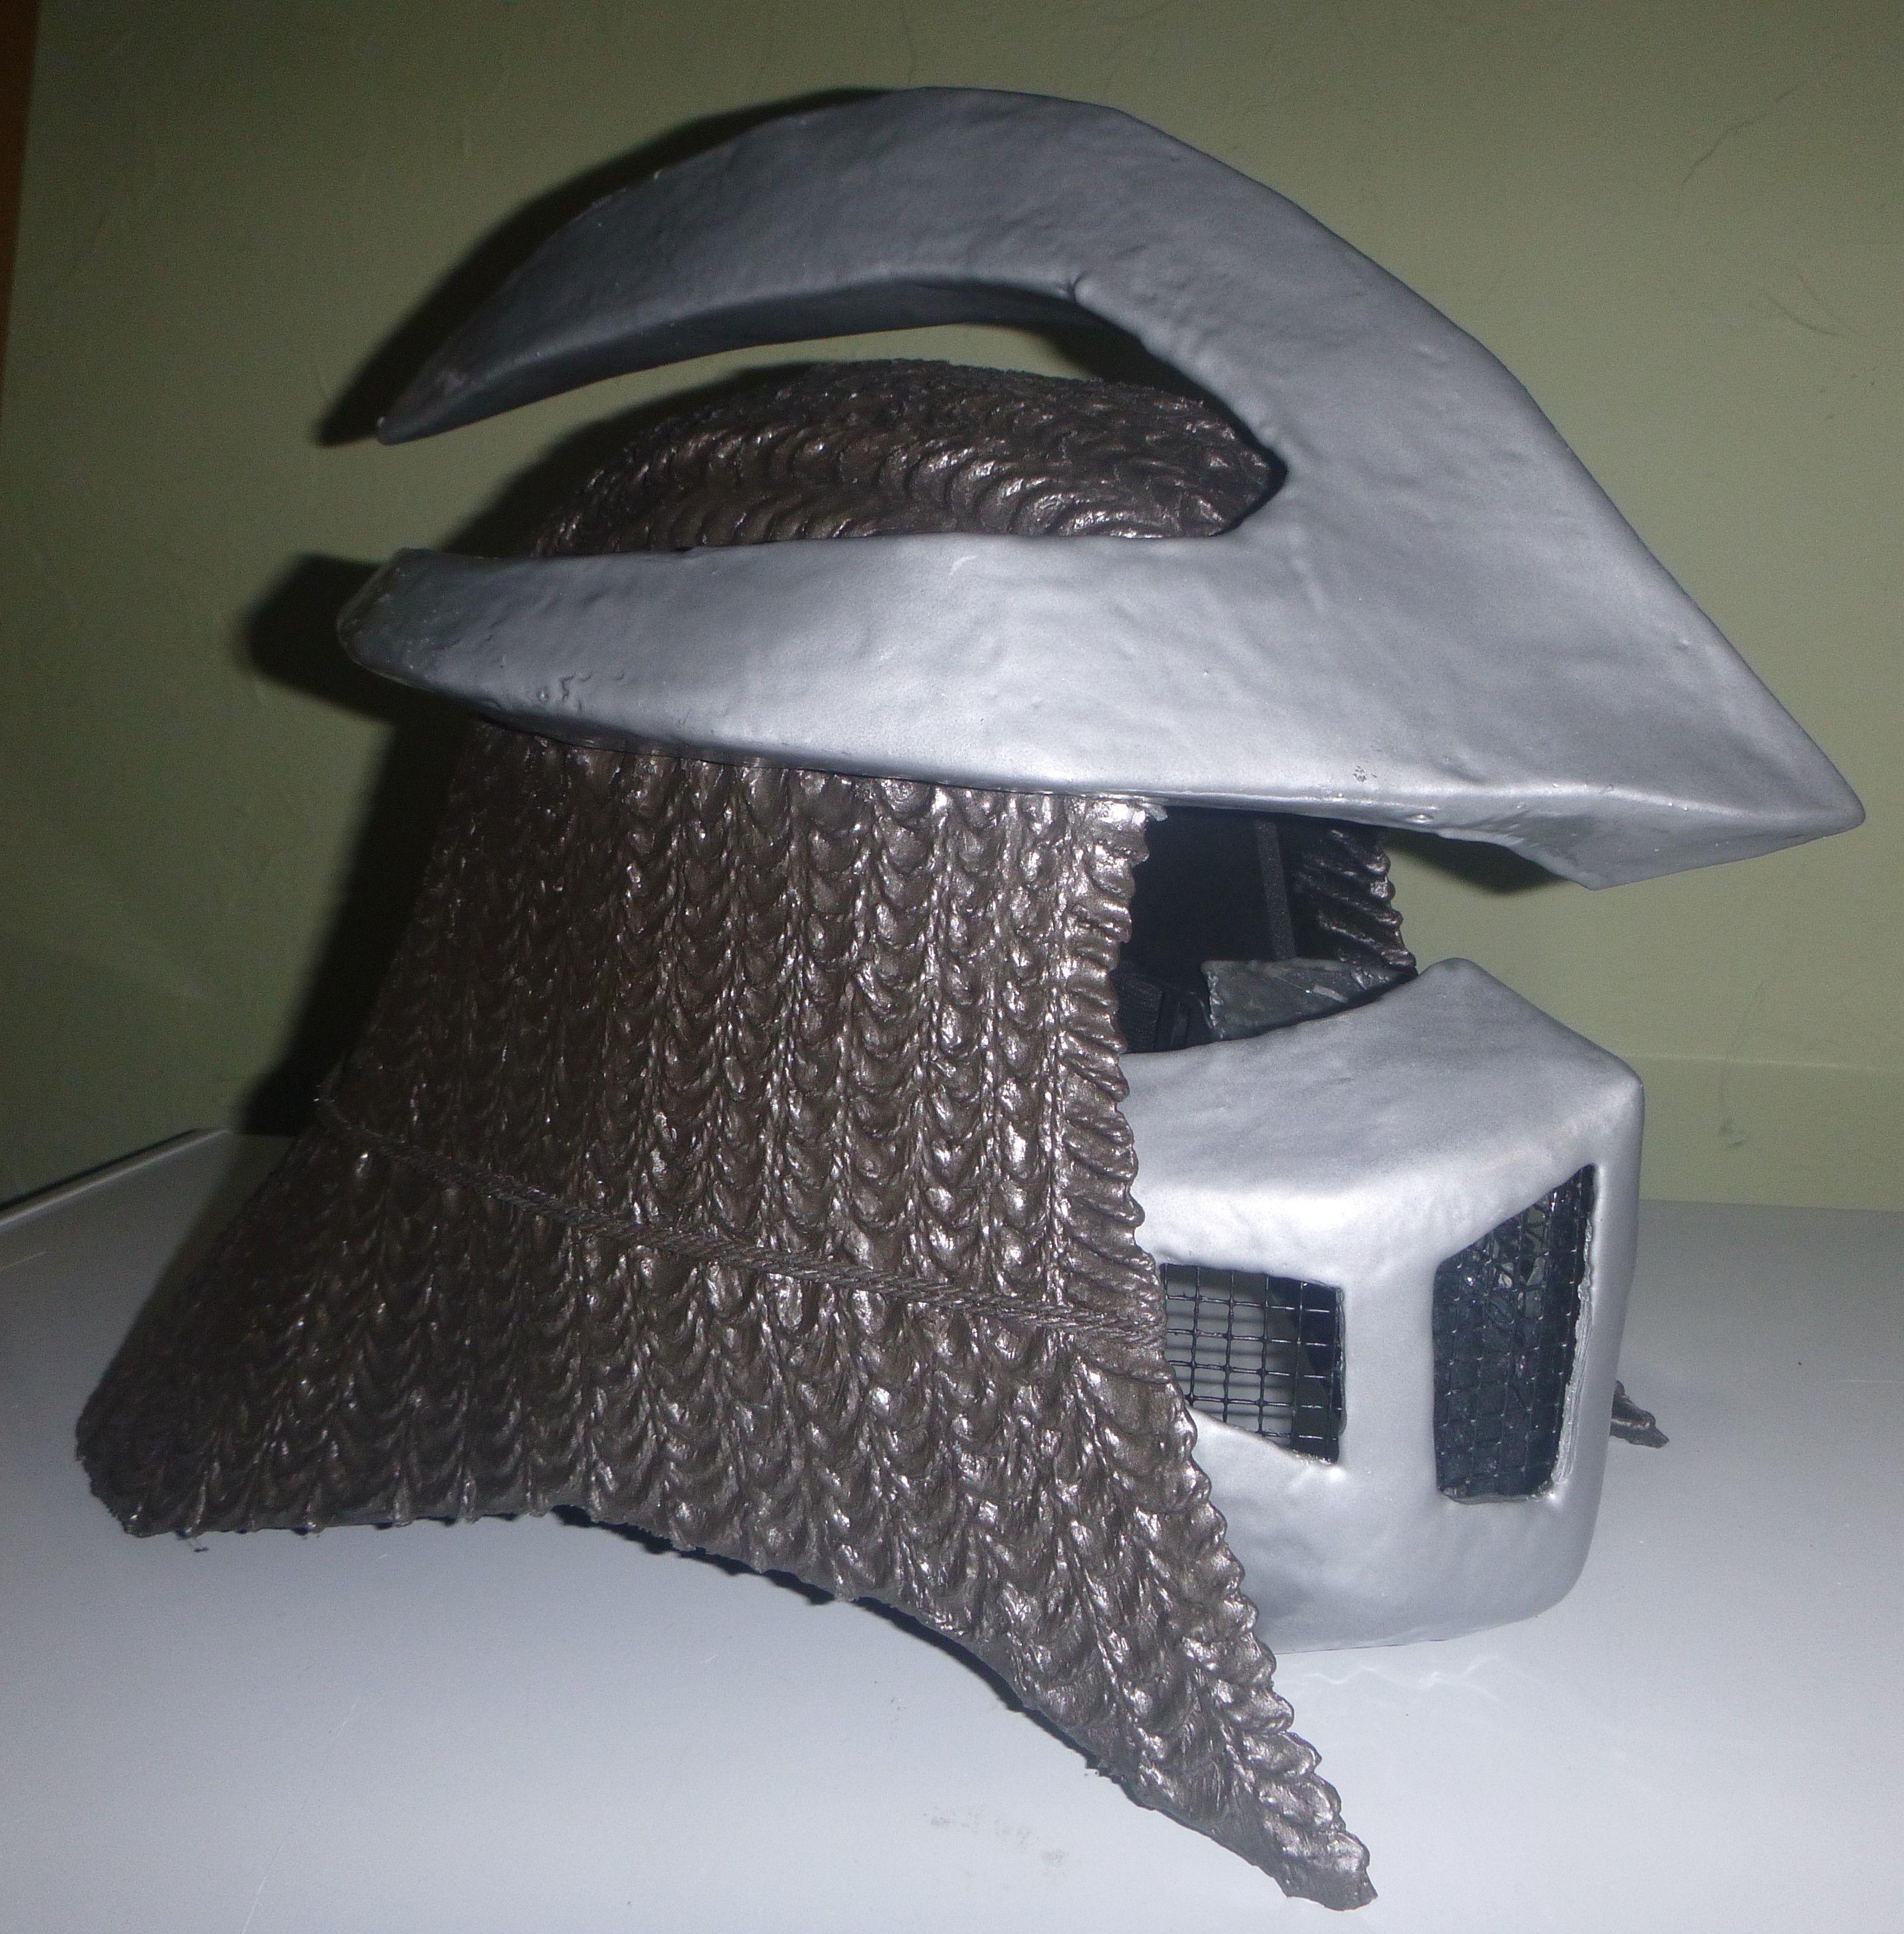 Movie Shredder Helmet By Dvdjbldwn Cool Masks Replica Prop